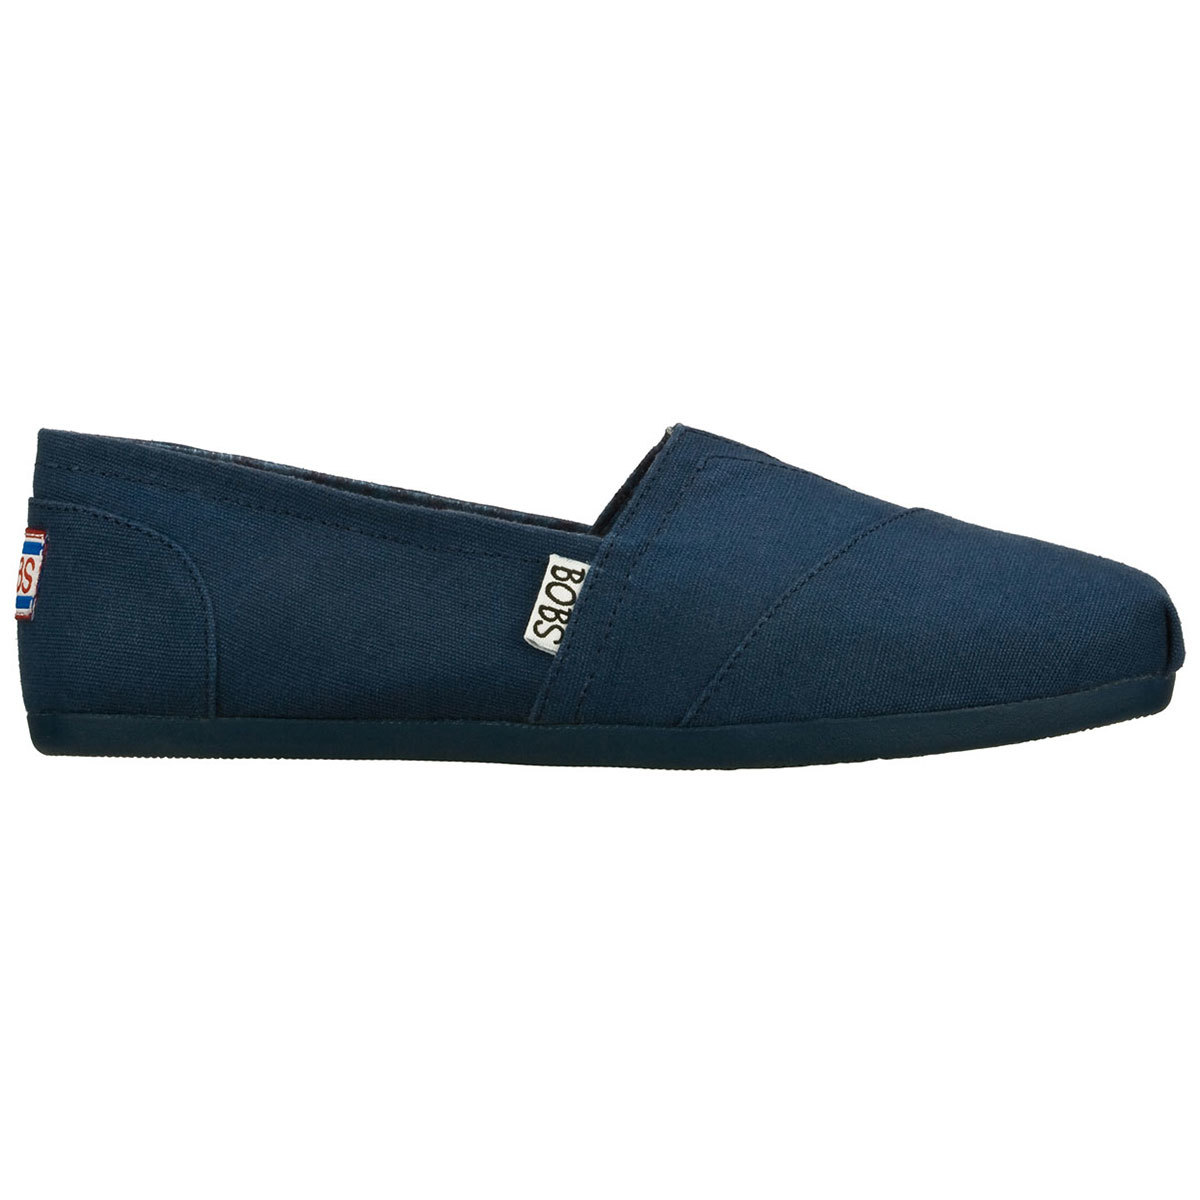 Bobs Plush Canvas Shoes, Navy